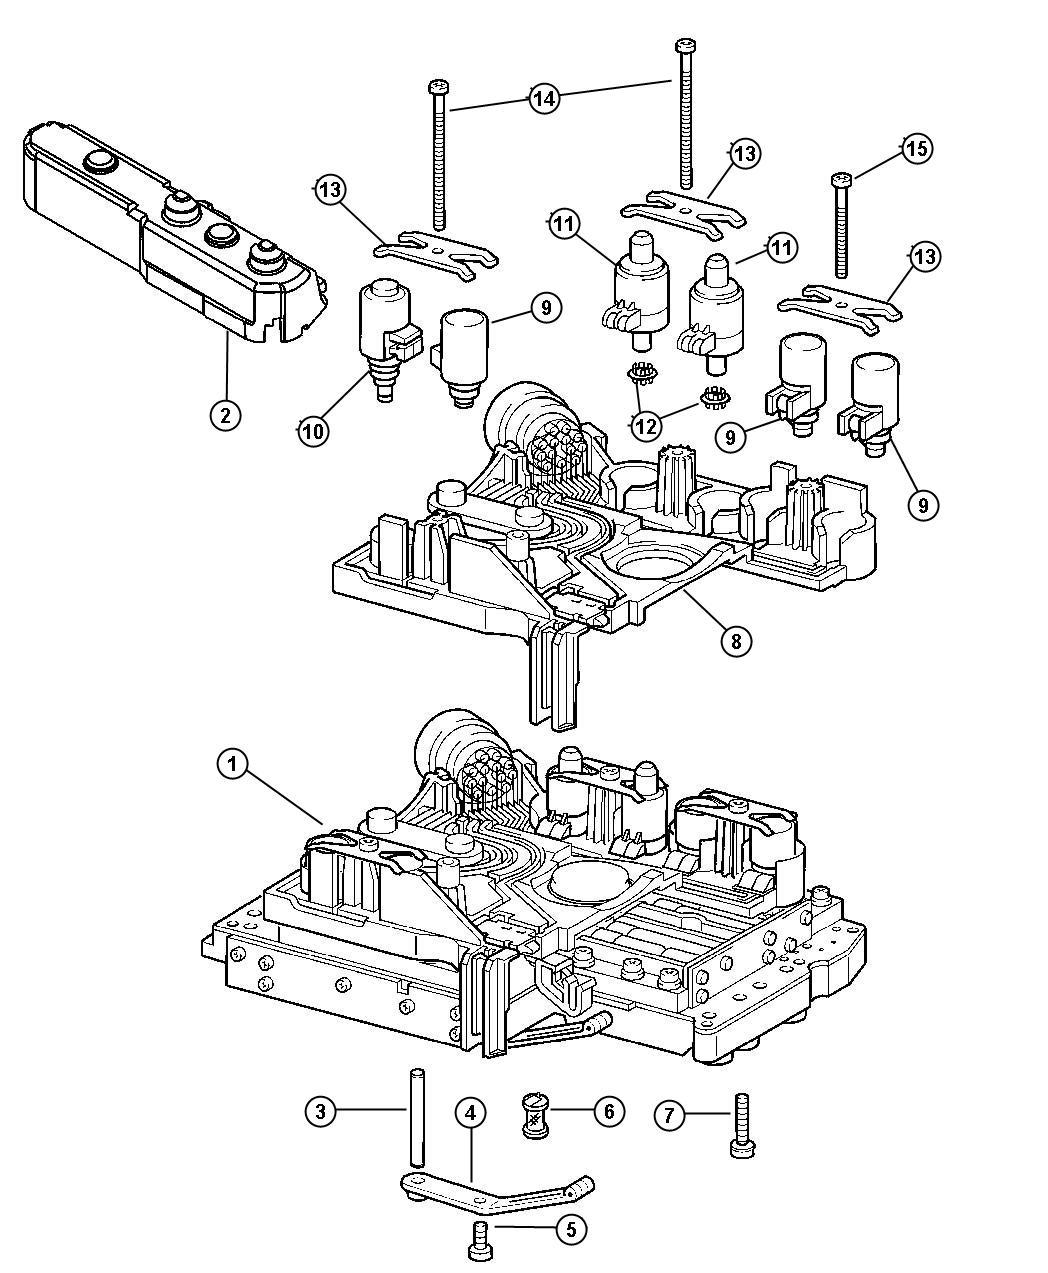 Dodge Caliber Valvebody Complete Hydraulic